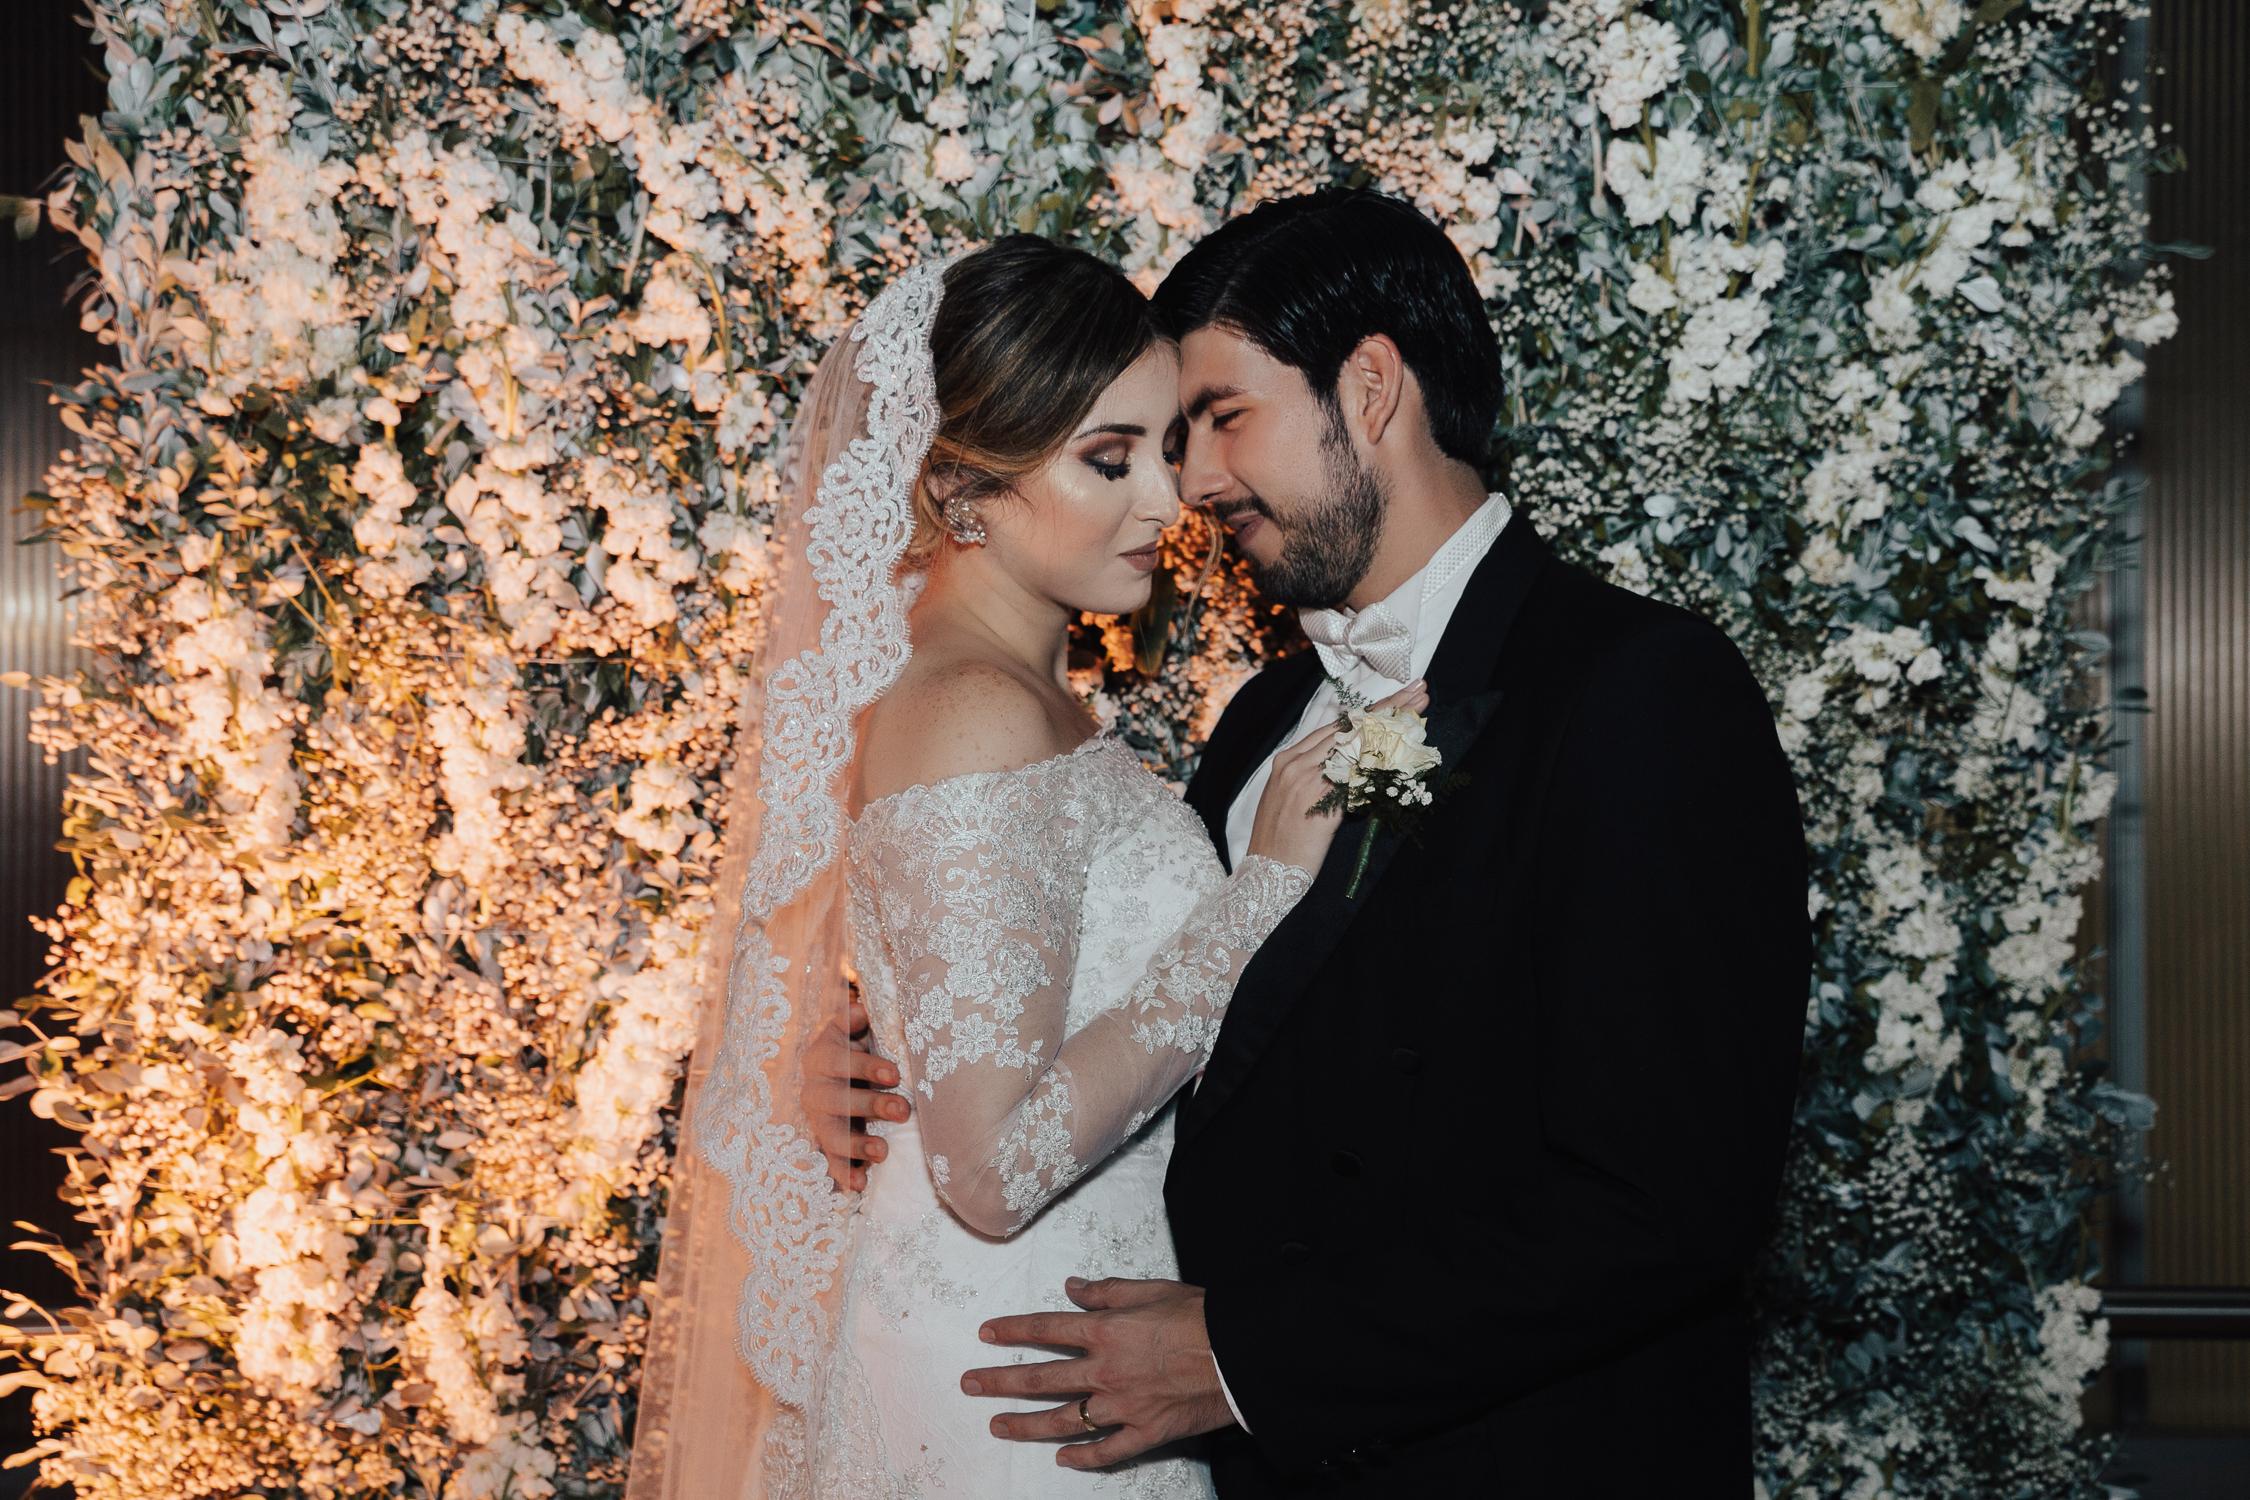 Michelle-Agurto-Fotografia-Bodas-Ecuador-Destination-Wedding-Photographer-Vicky-Javier-168.JPG